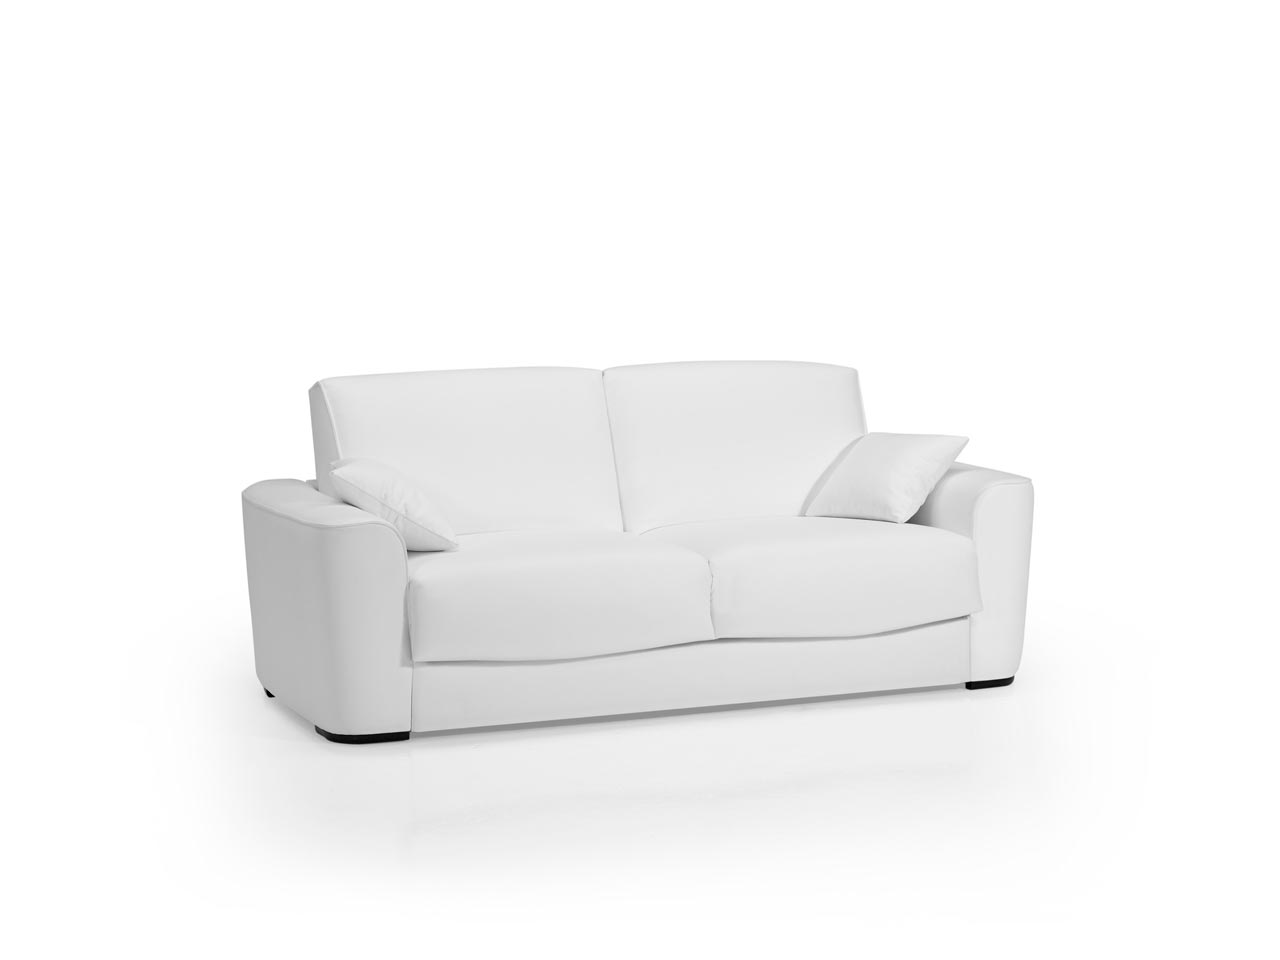 Sof s modernos innovaci n y dise o para su sal n la for Sofa blanco barato